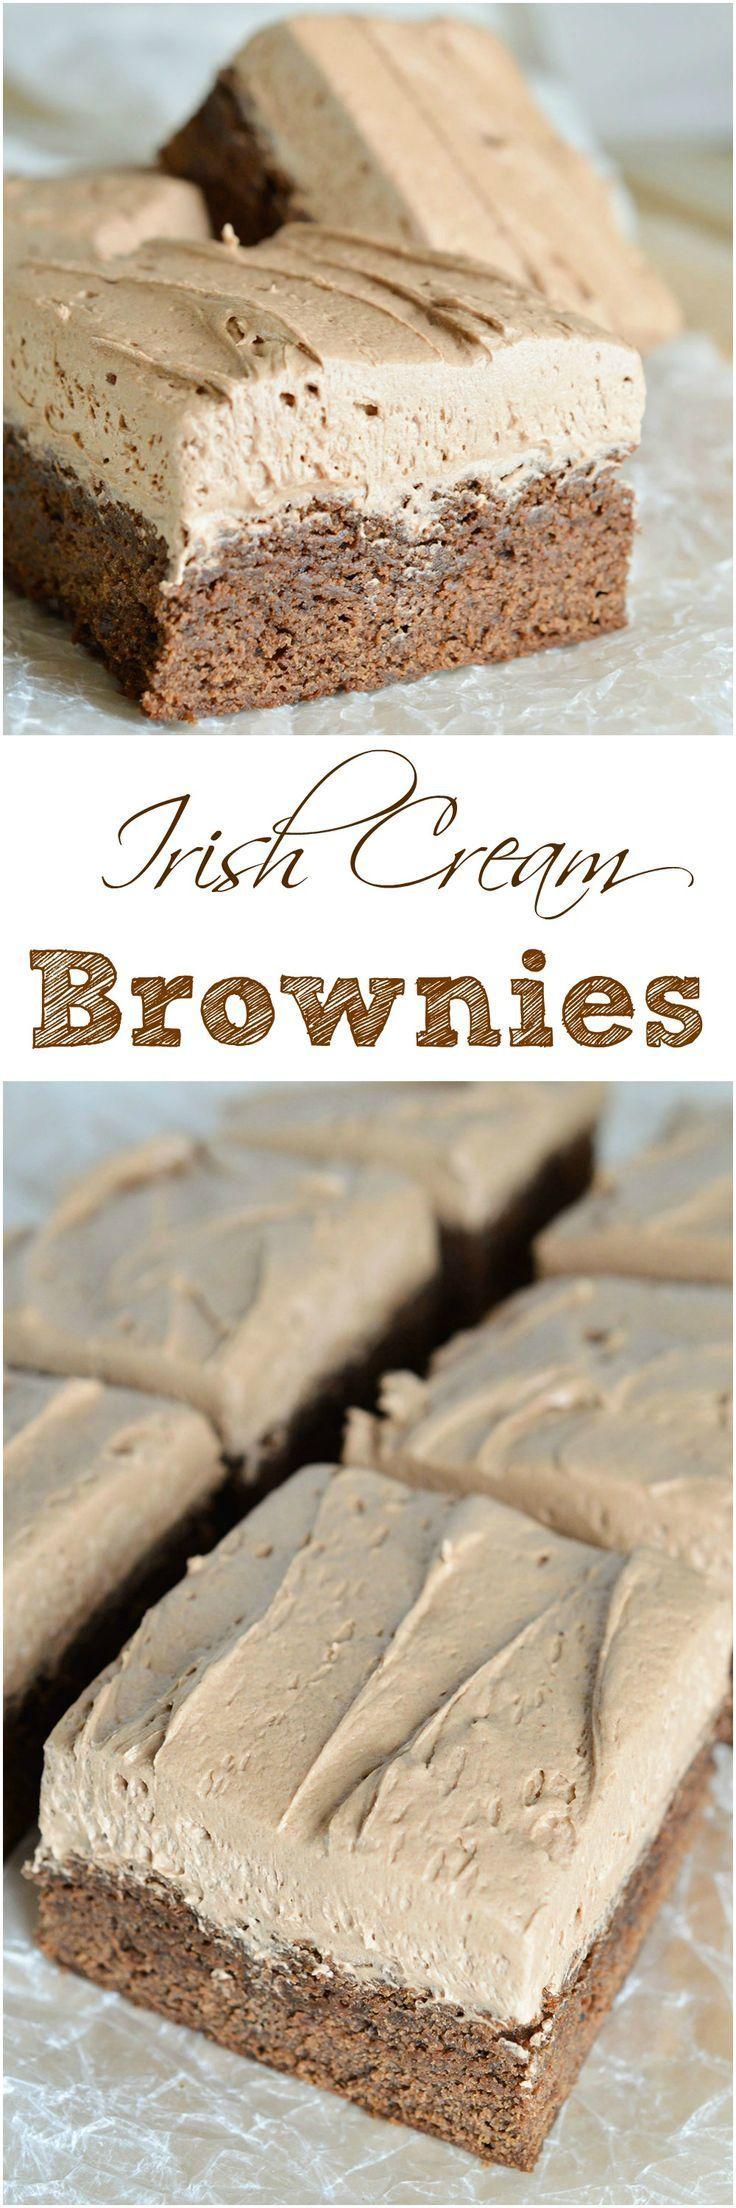 Irish Cream Chocolate Brownie Recipe - This easy brownie� #christmasgifts #merrychristmas #xmasgifts #holidaygift #northernireland #discoverireland #loves_ireland